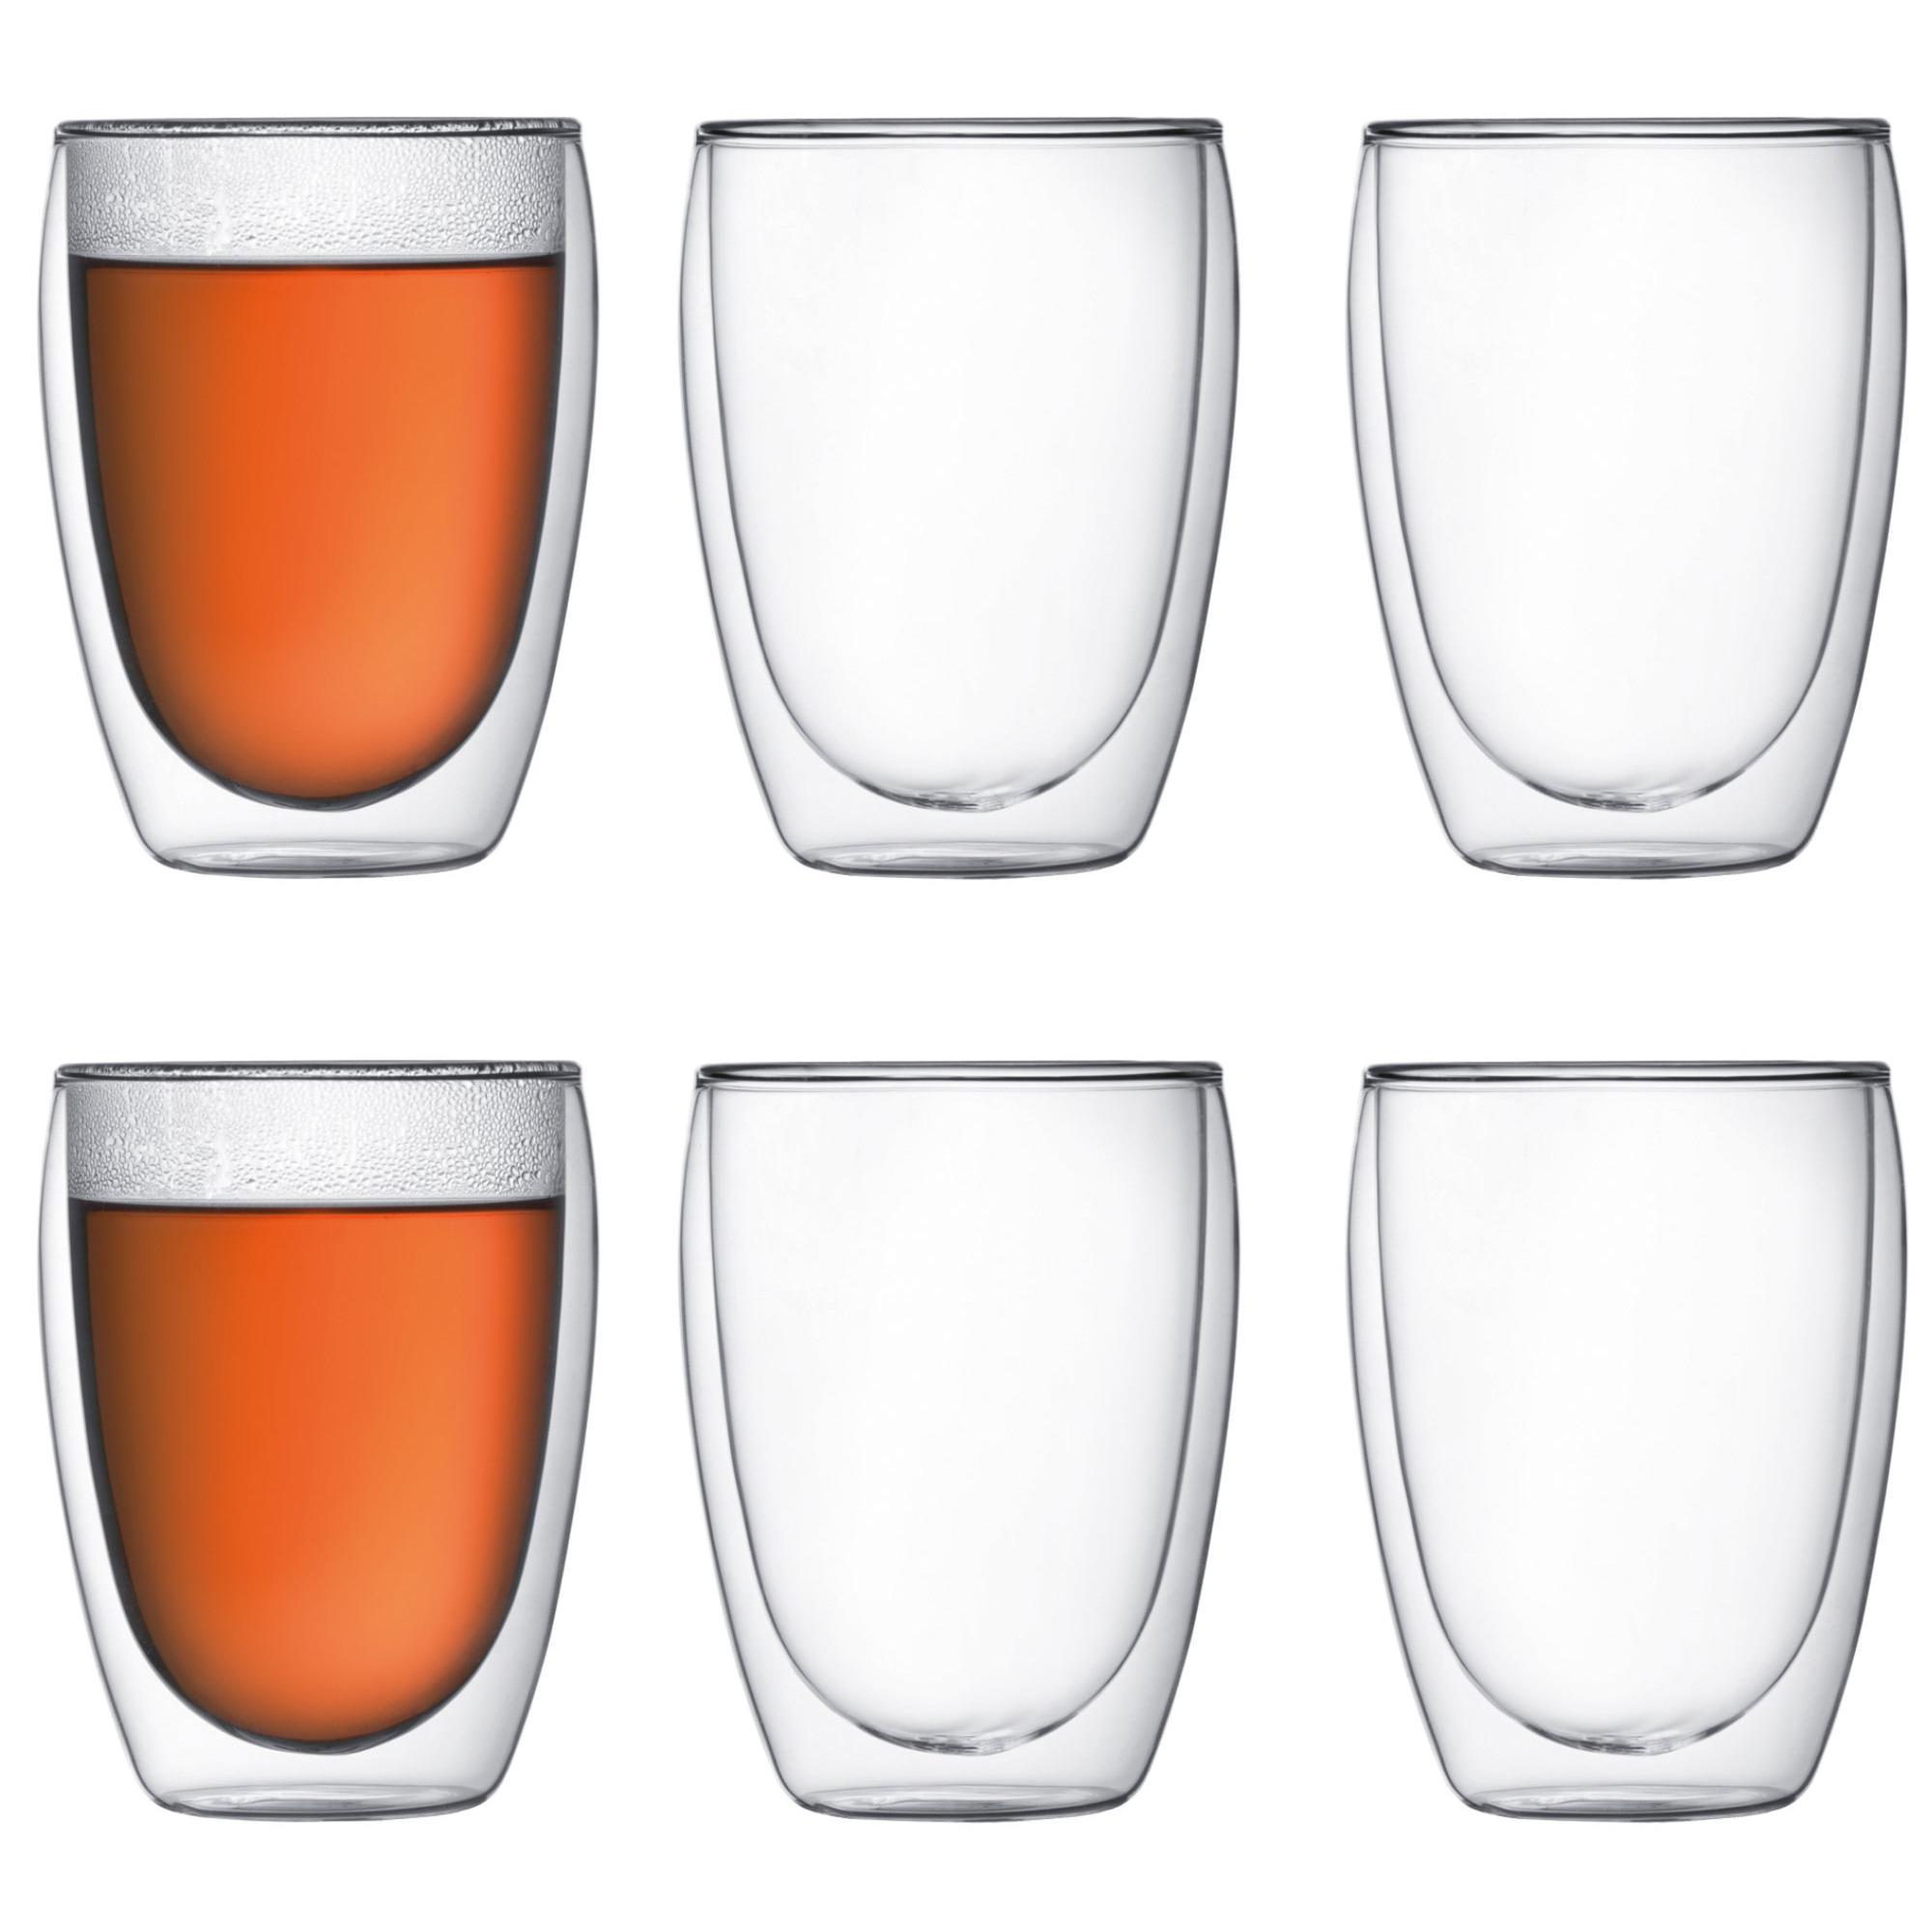 Bodum Pavina Dubbelväggigt glas Medium 6 pack